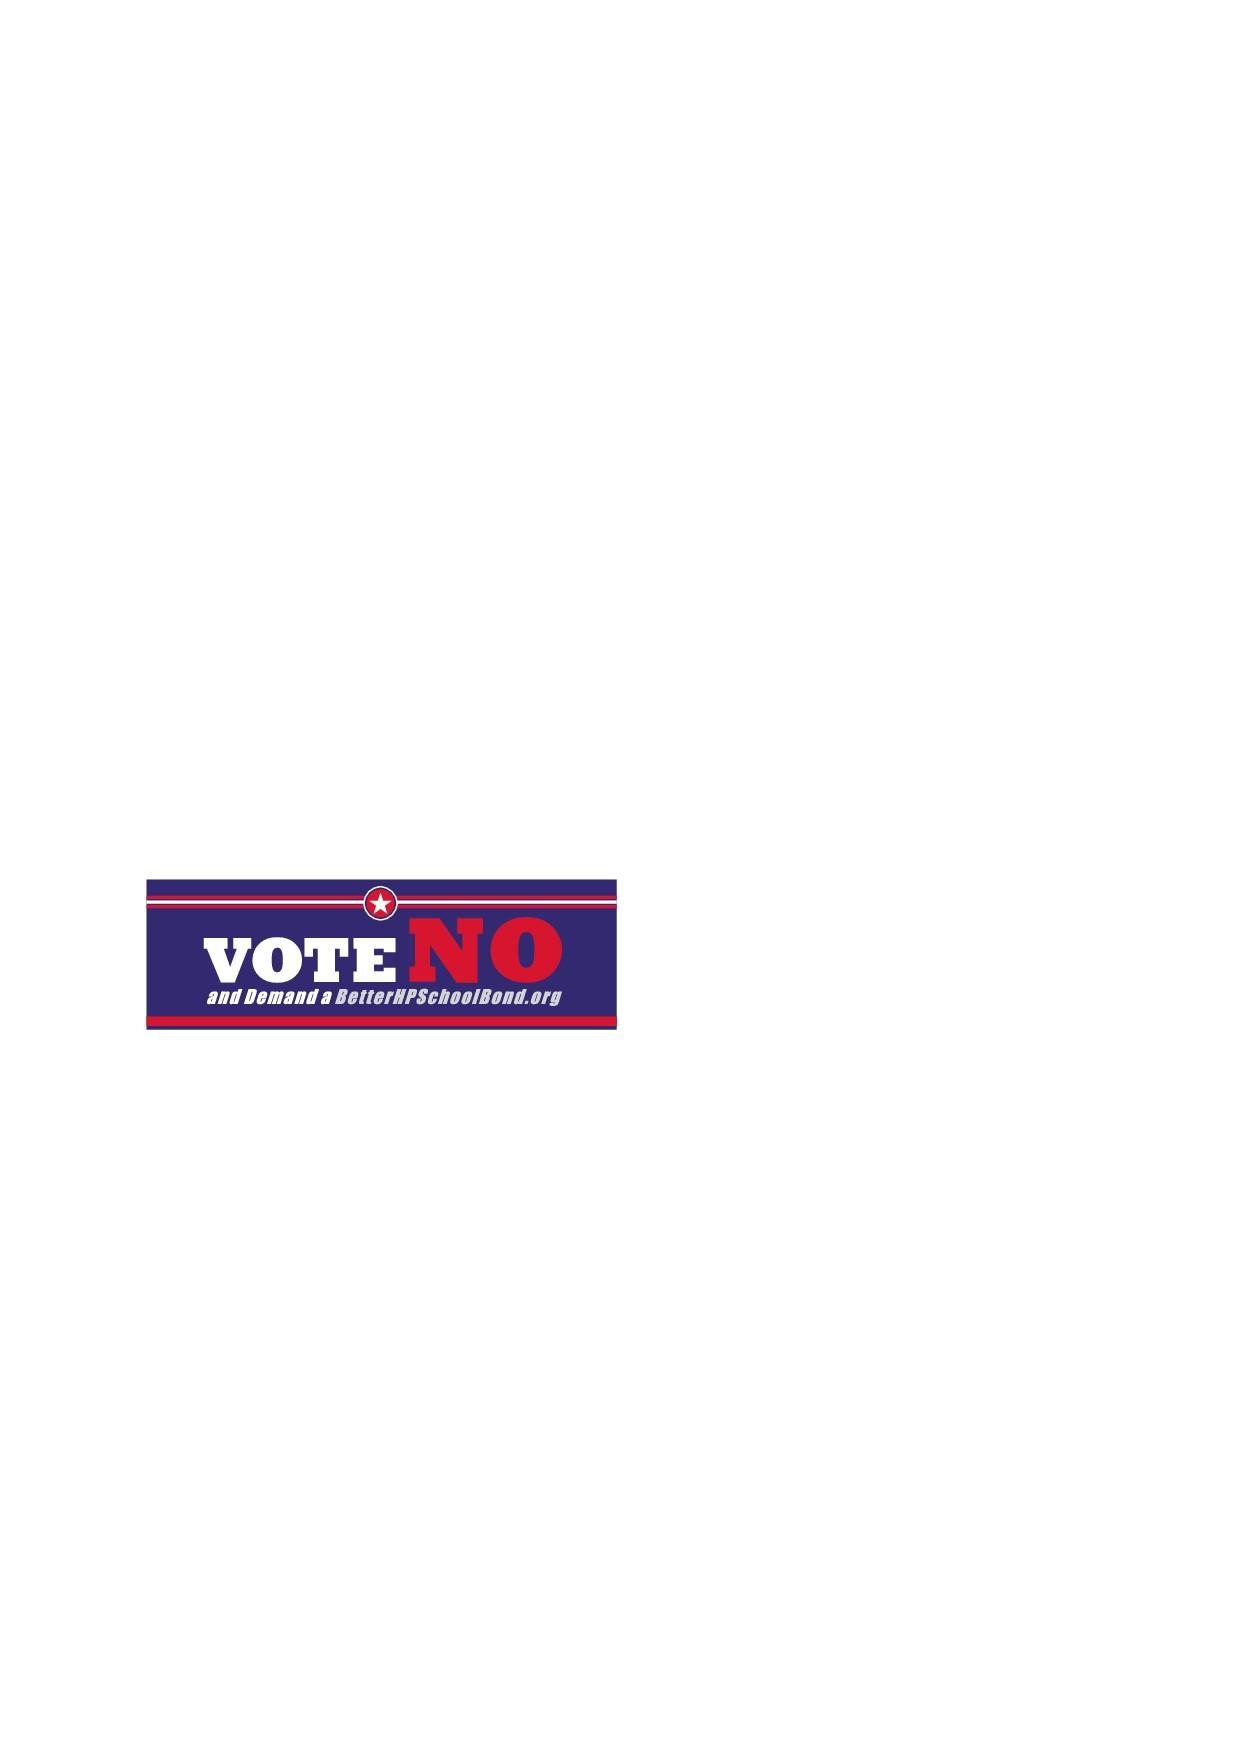 Create a Logo for a campaign